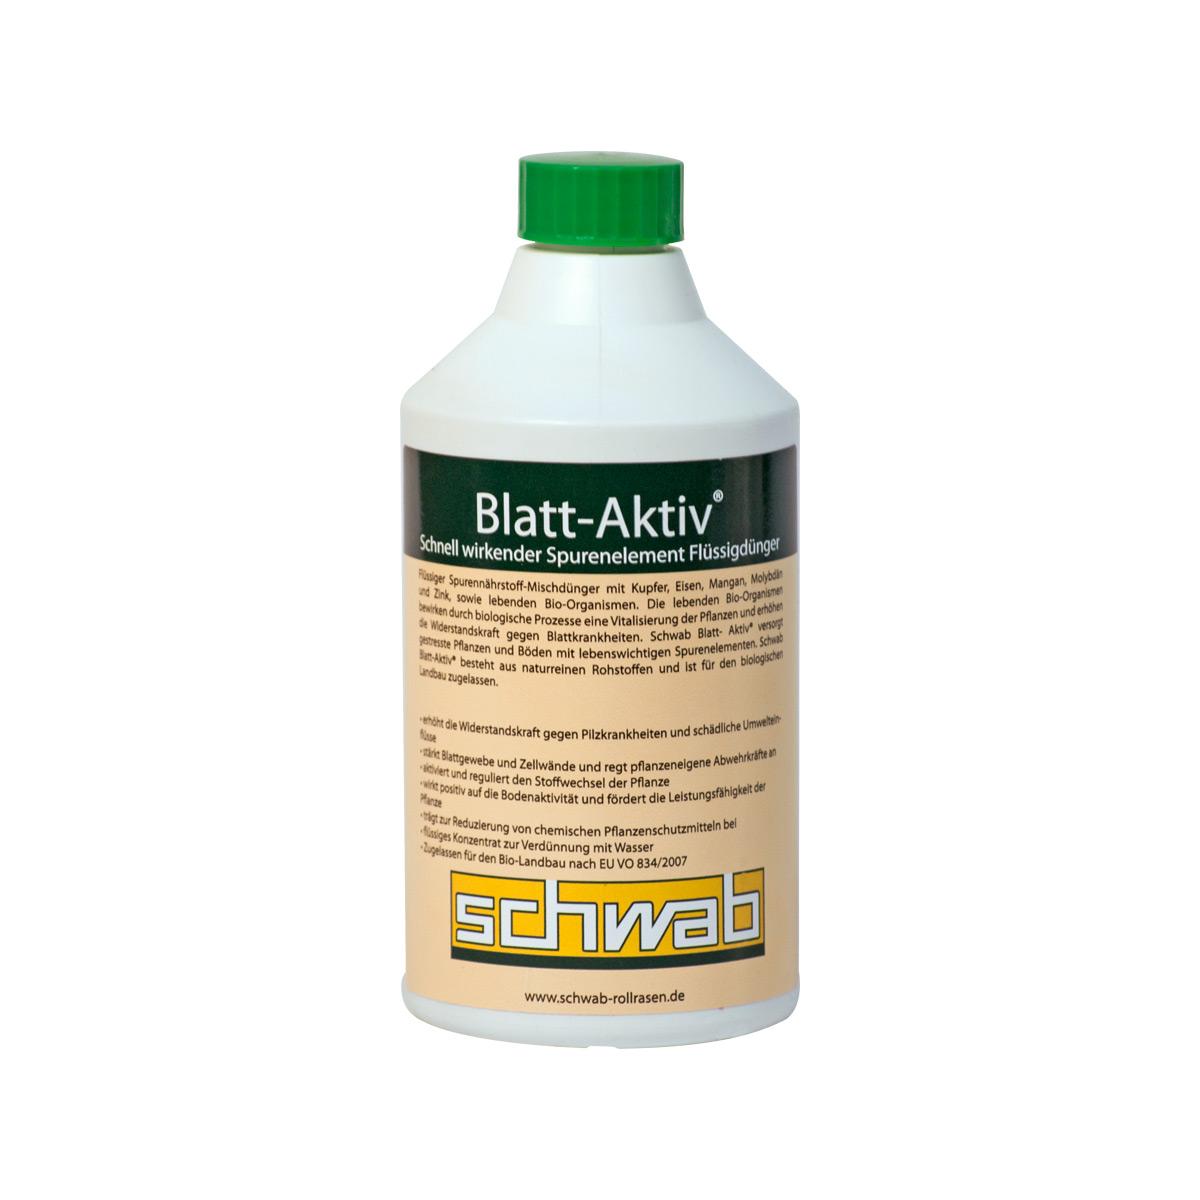 Blattaktiv® Hobby-Konzentrat 0,5 Liter